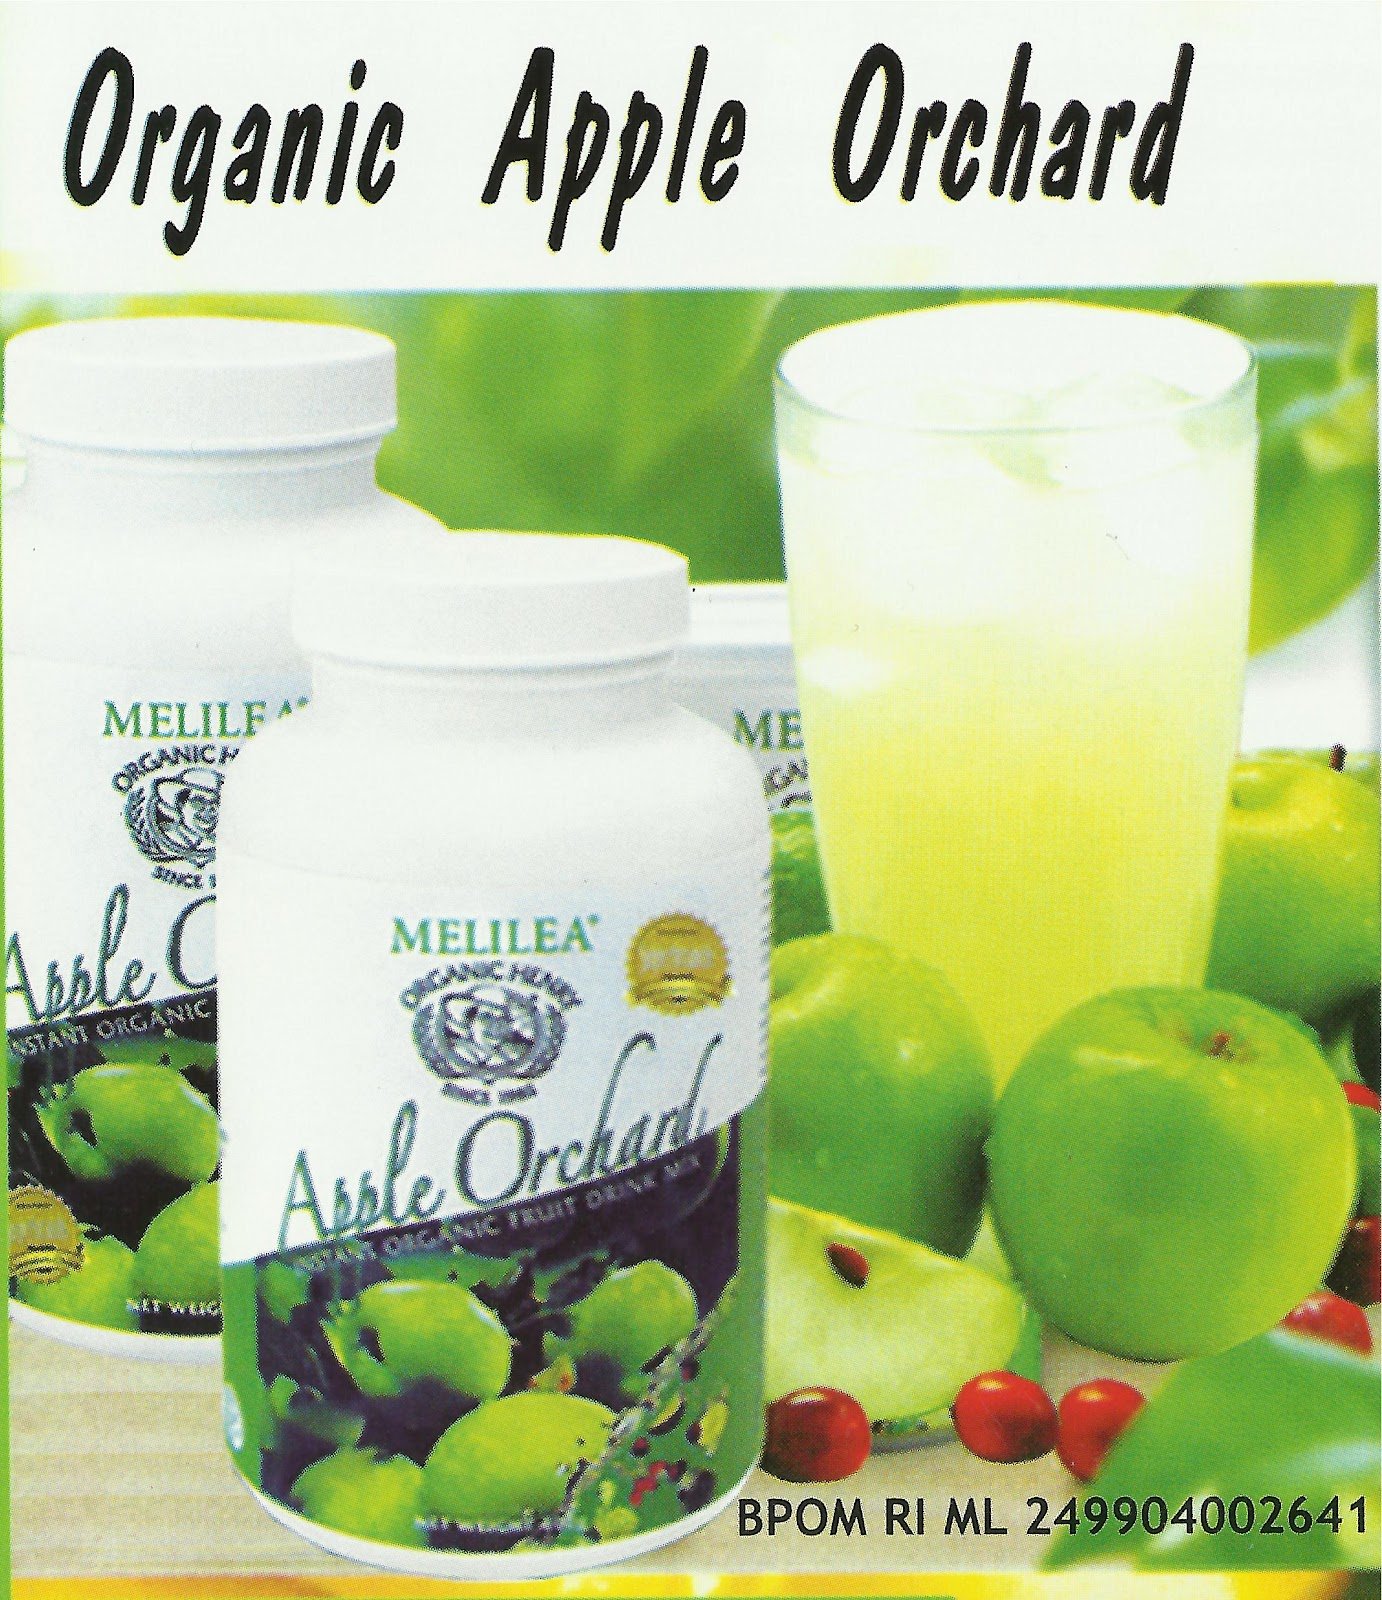 Melilea Minuman Serbuk Apel Hijau Instan Susu Kedelai Organik